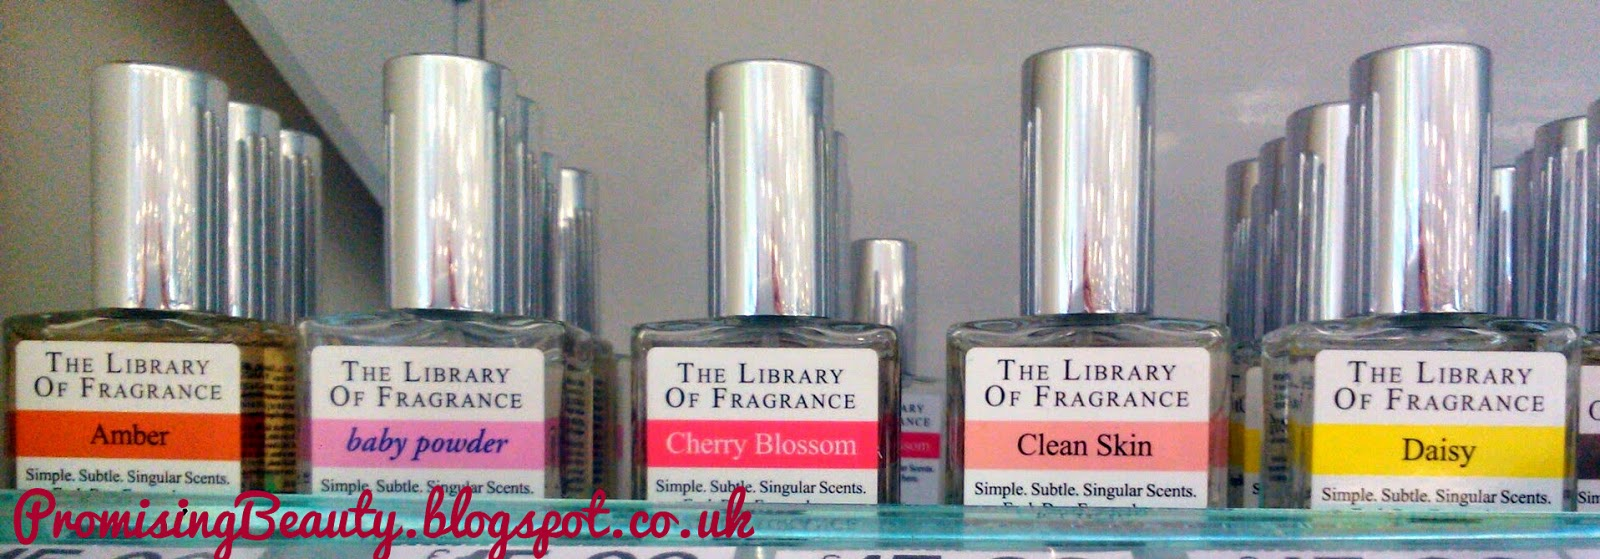 amber, baby powder, cherry blossom, clean skin, daisy